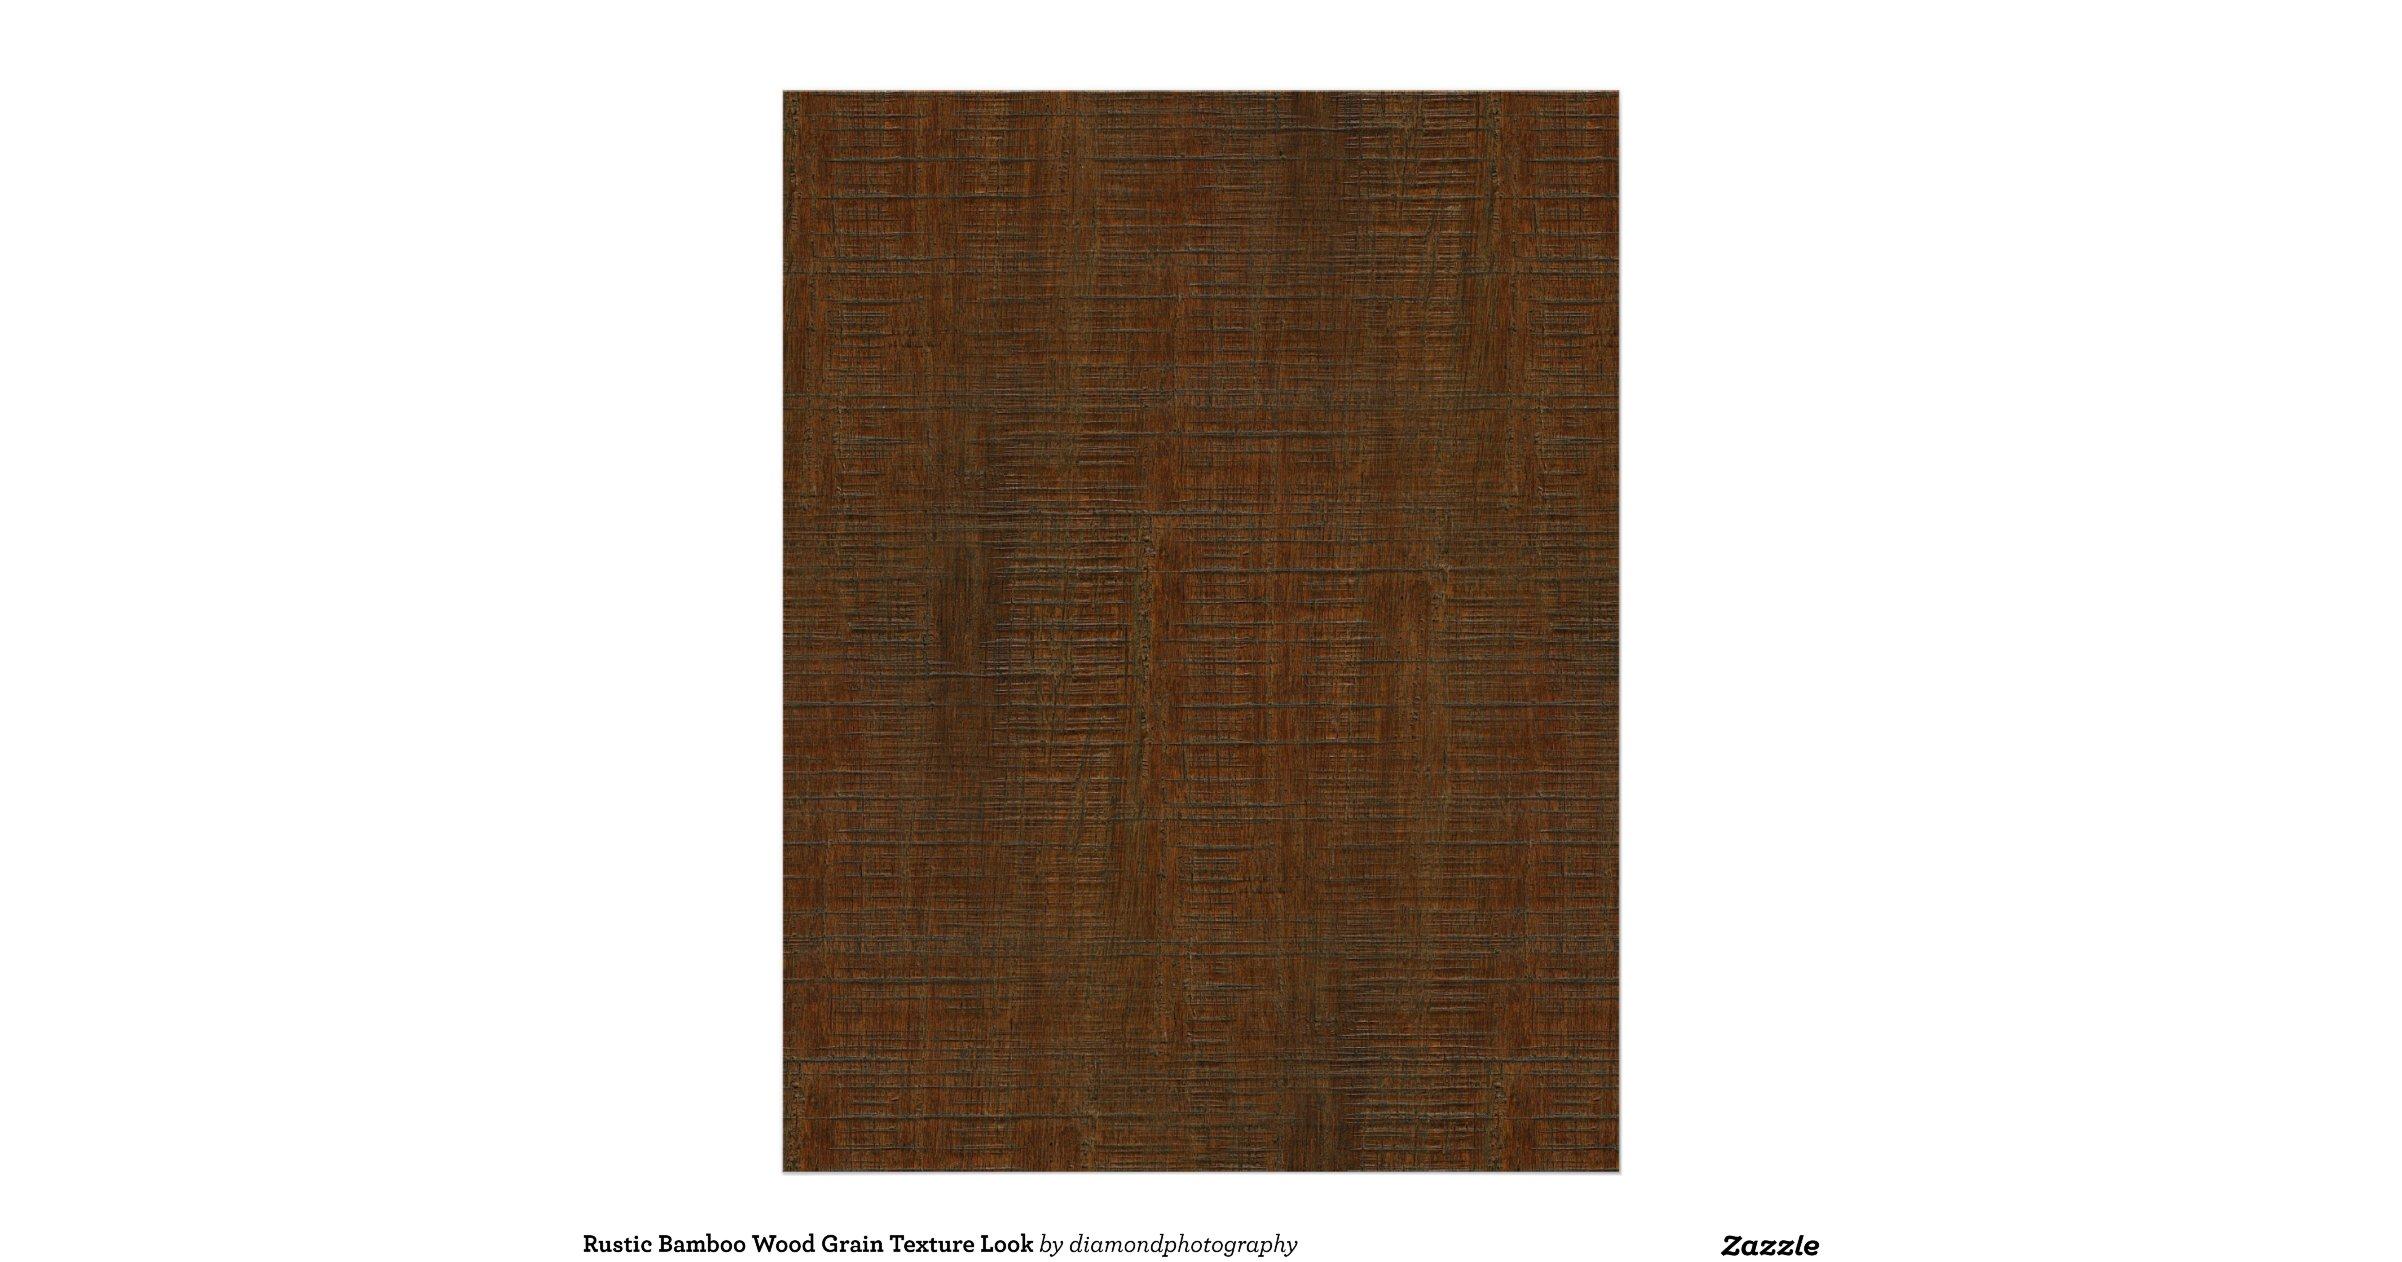 rustic bamboo wood grain texture look letterhead